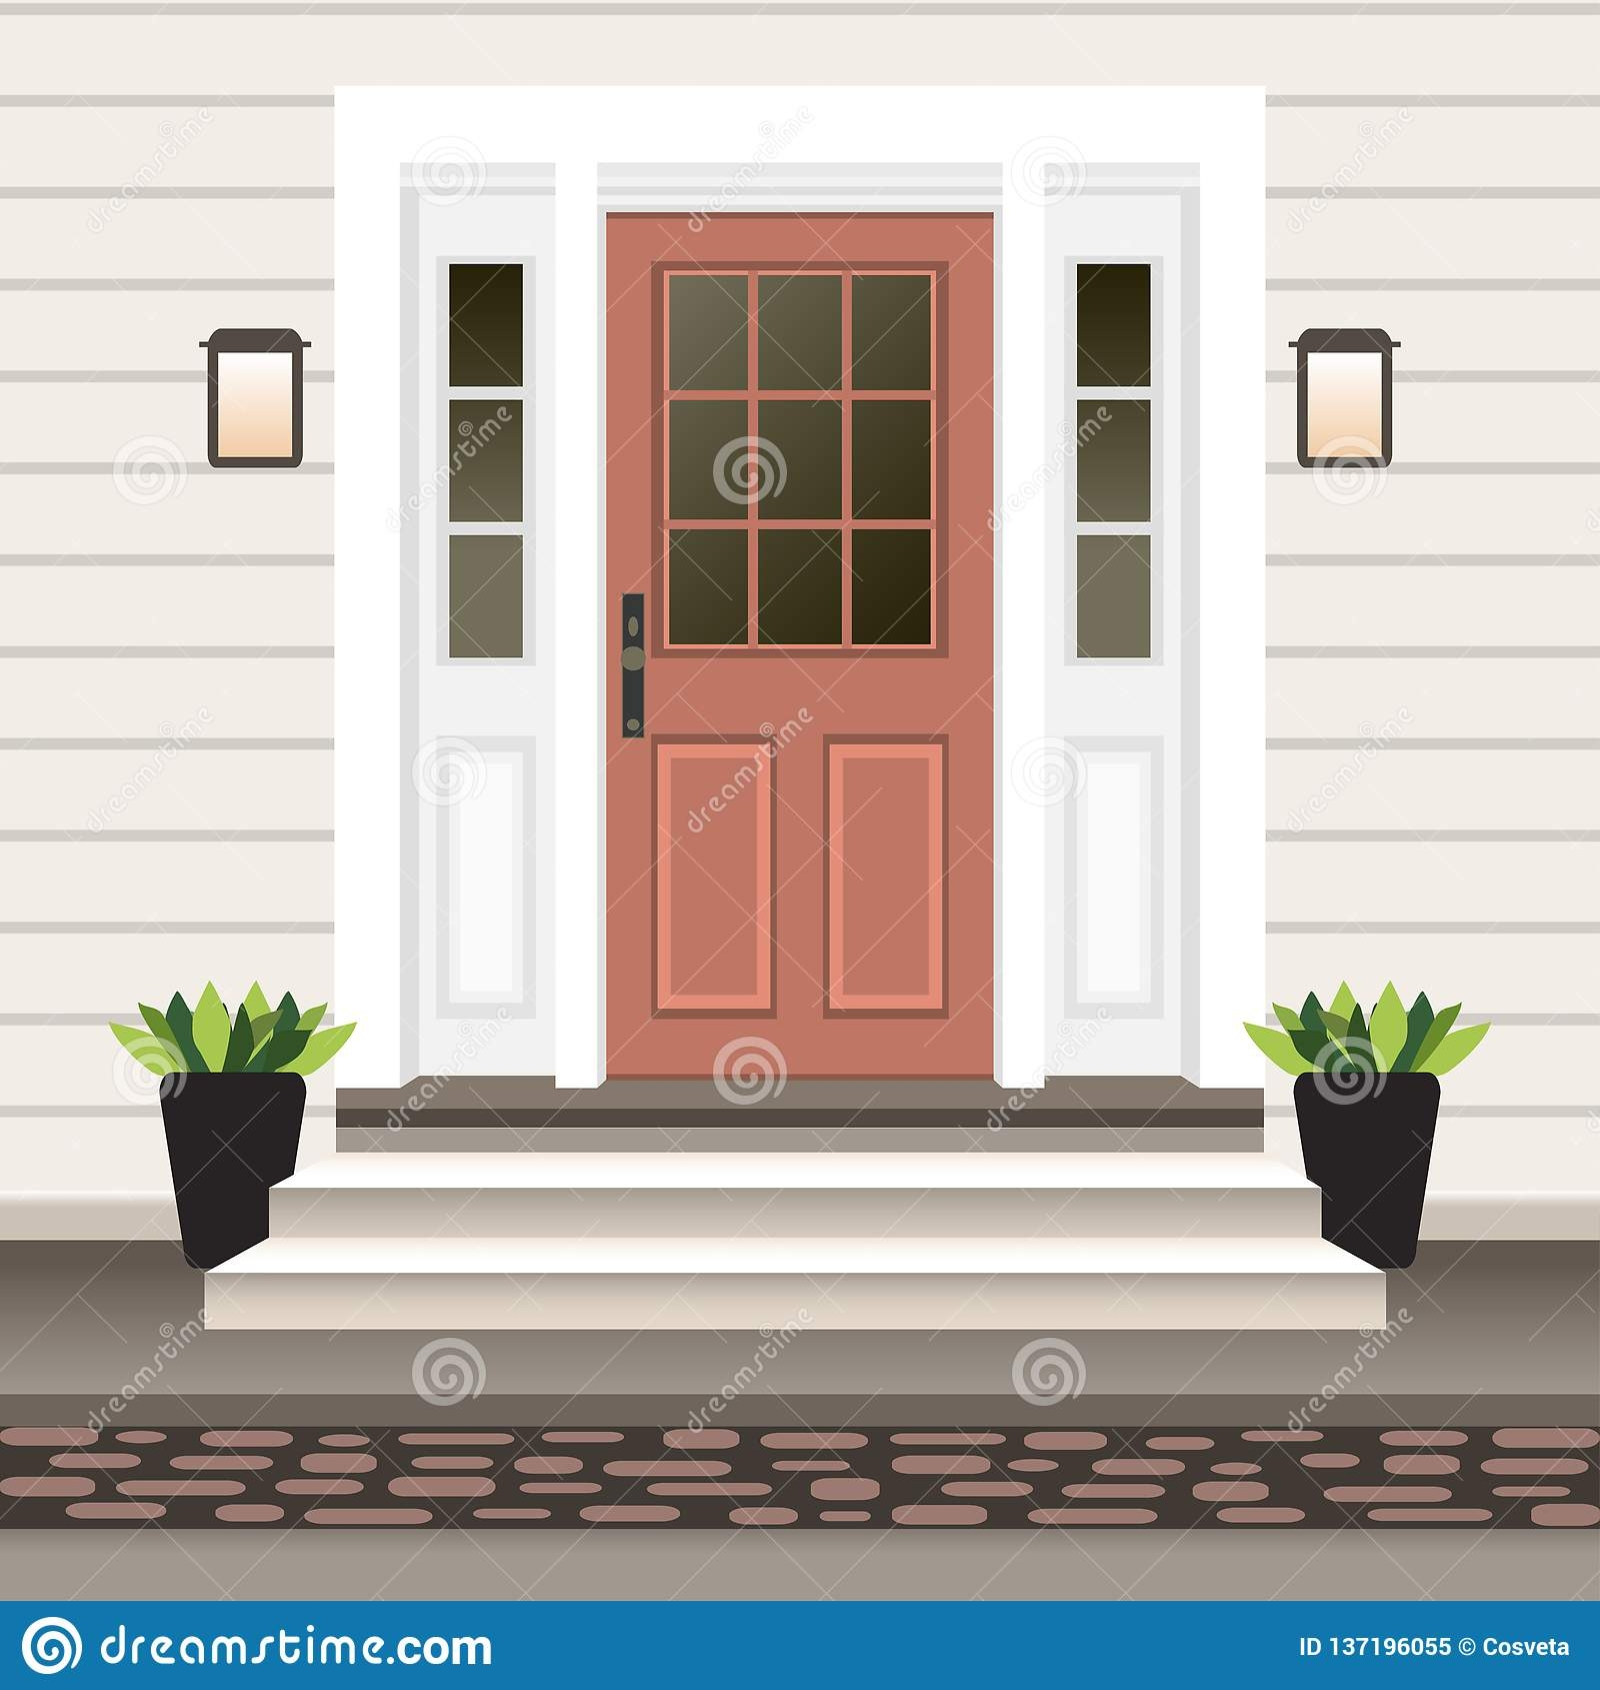 Door Exterior Stock Illustrations – 43 950 Door Exterior Stock | House Front Step Design | Aspen Designer Home | Simple | Mansion | Curved | Entrance Home